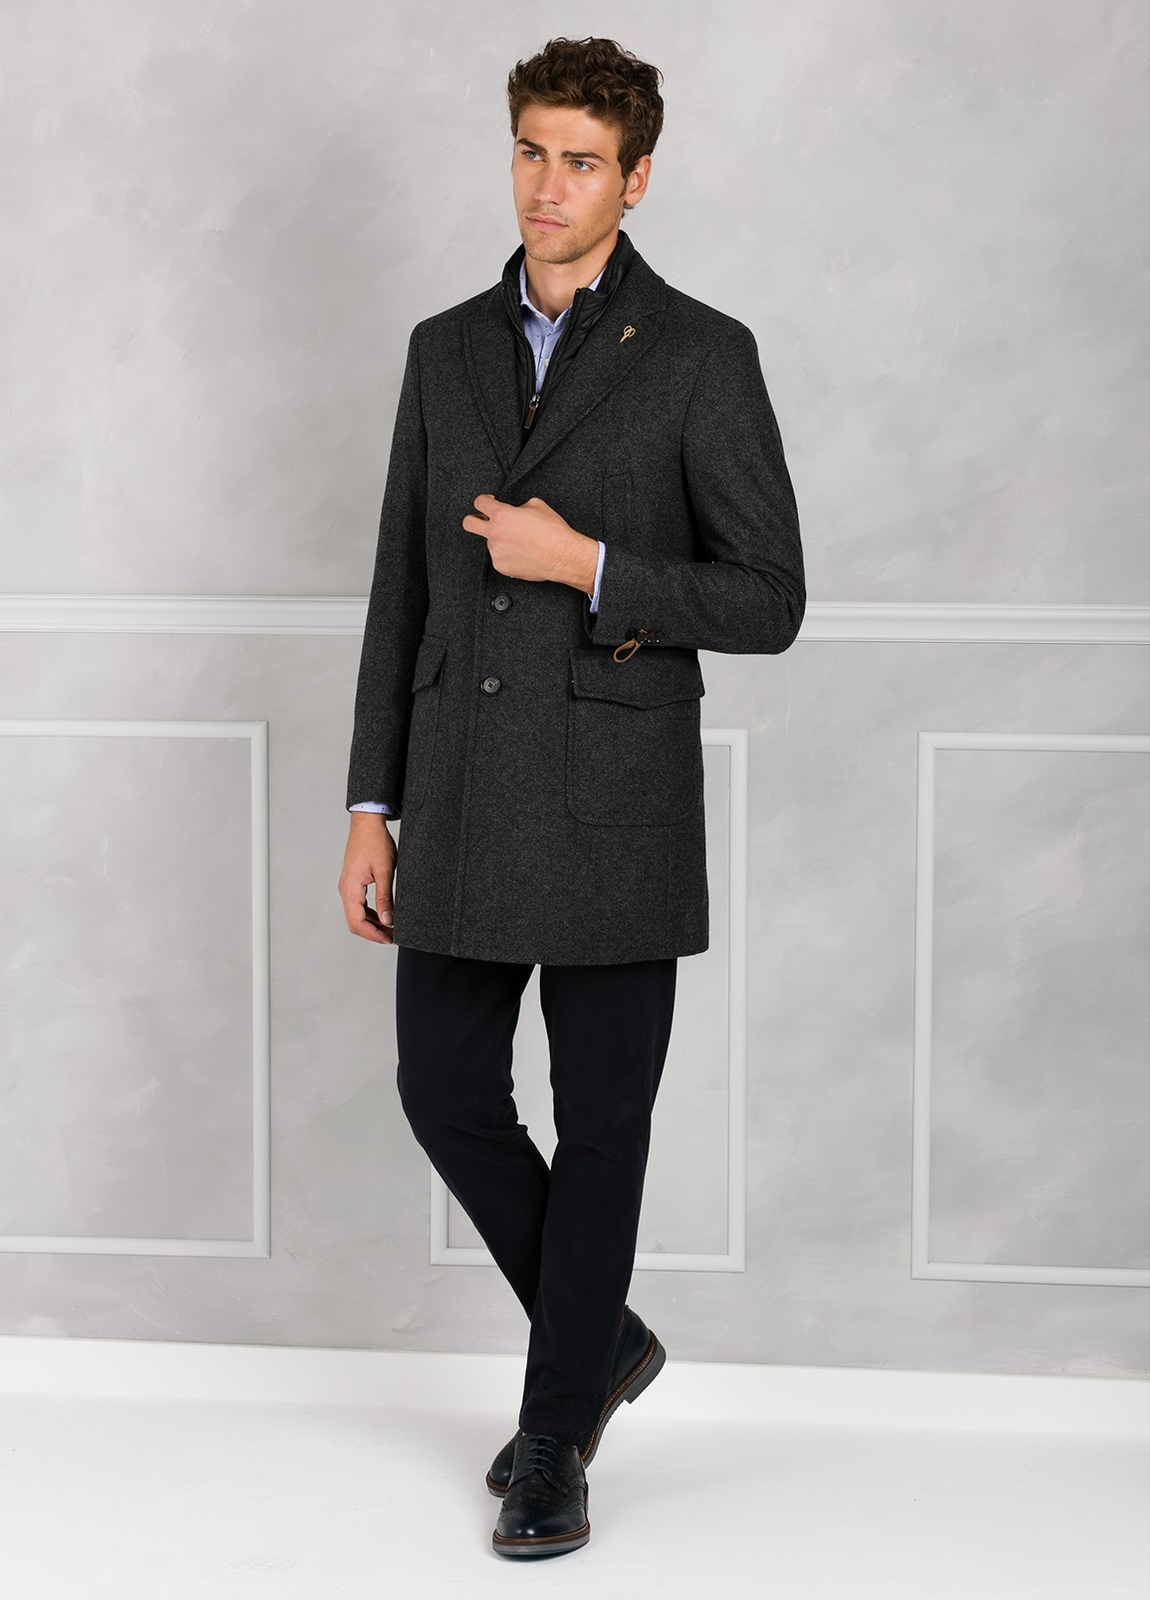 Abrigo tres botones color gris con pecherín interior. 65% Lana 30% Poliamida 5% fibras. - Ítem2